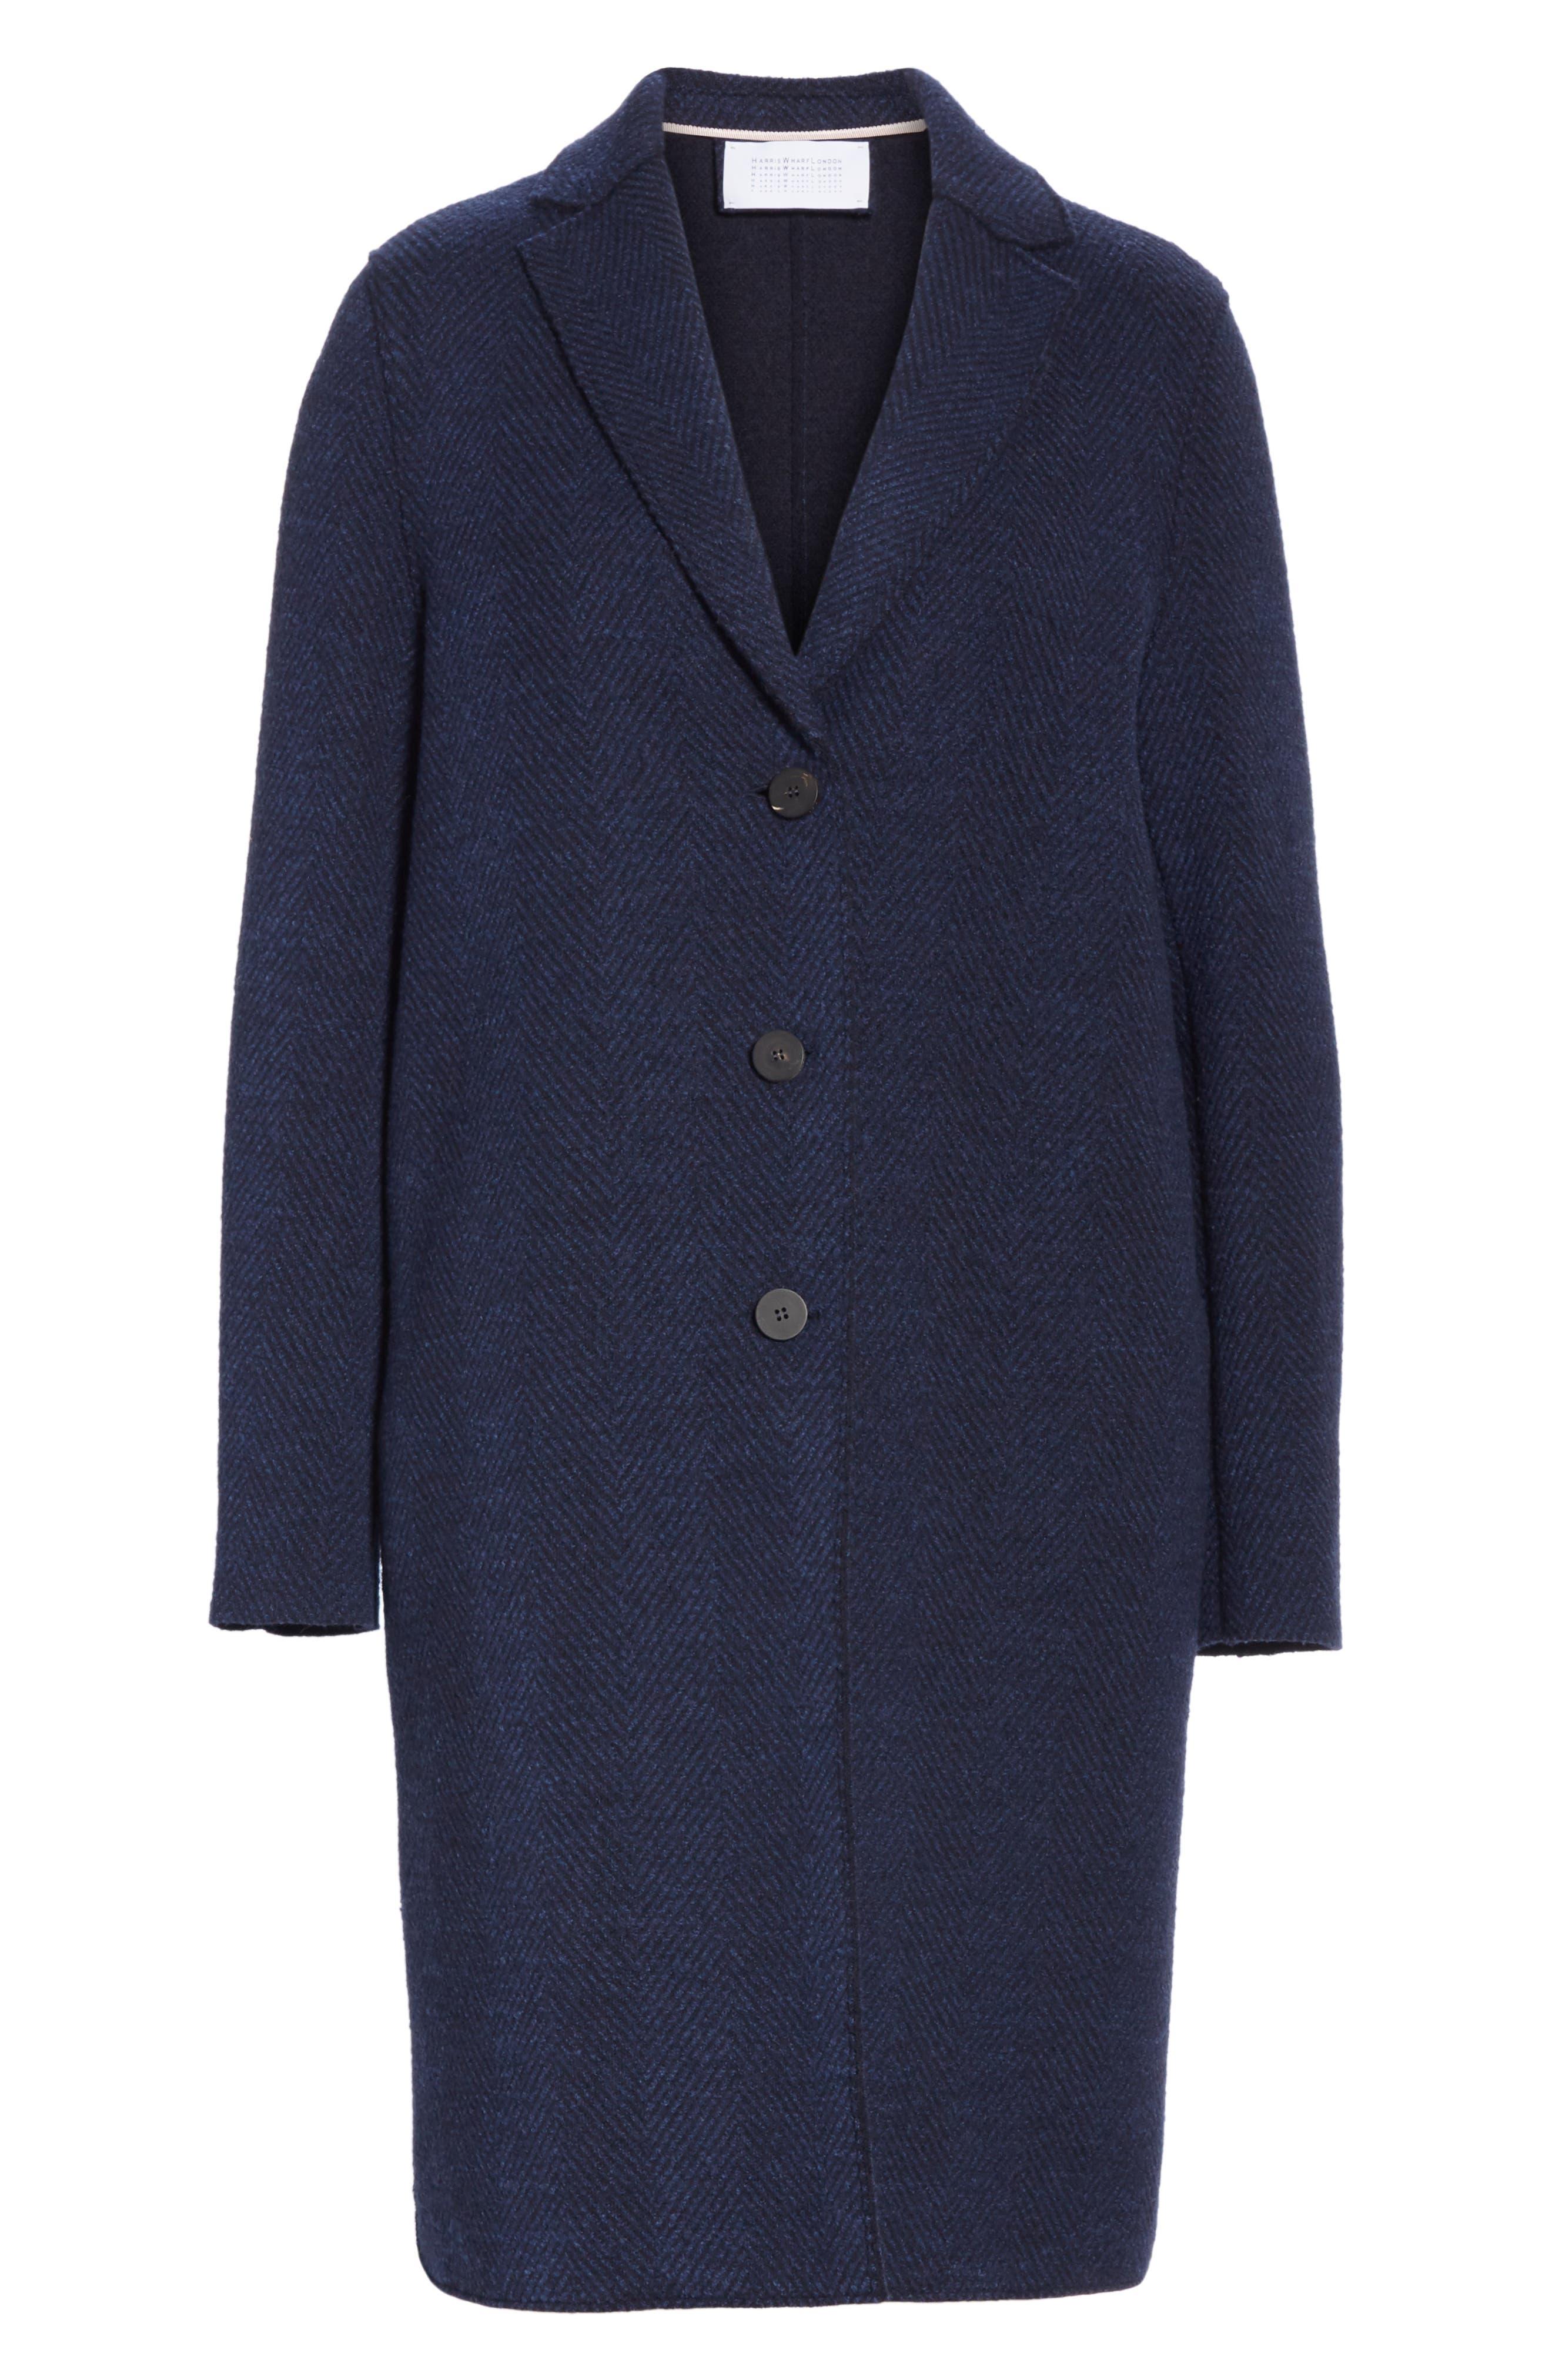 Herringbone Wool Coat,                             Alternate thumbnail 6, color,                             NAVY BLUE